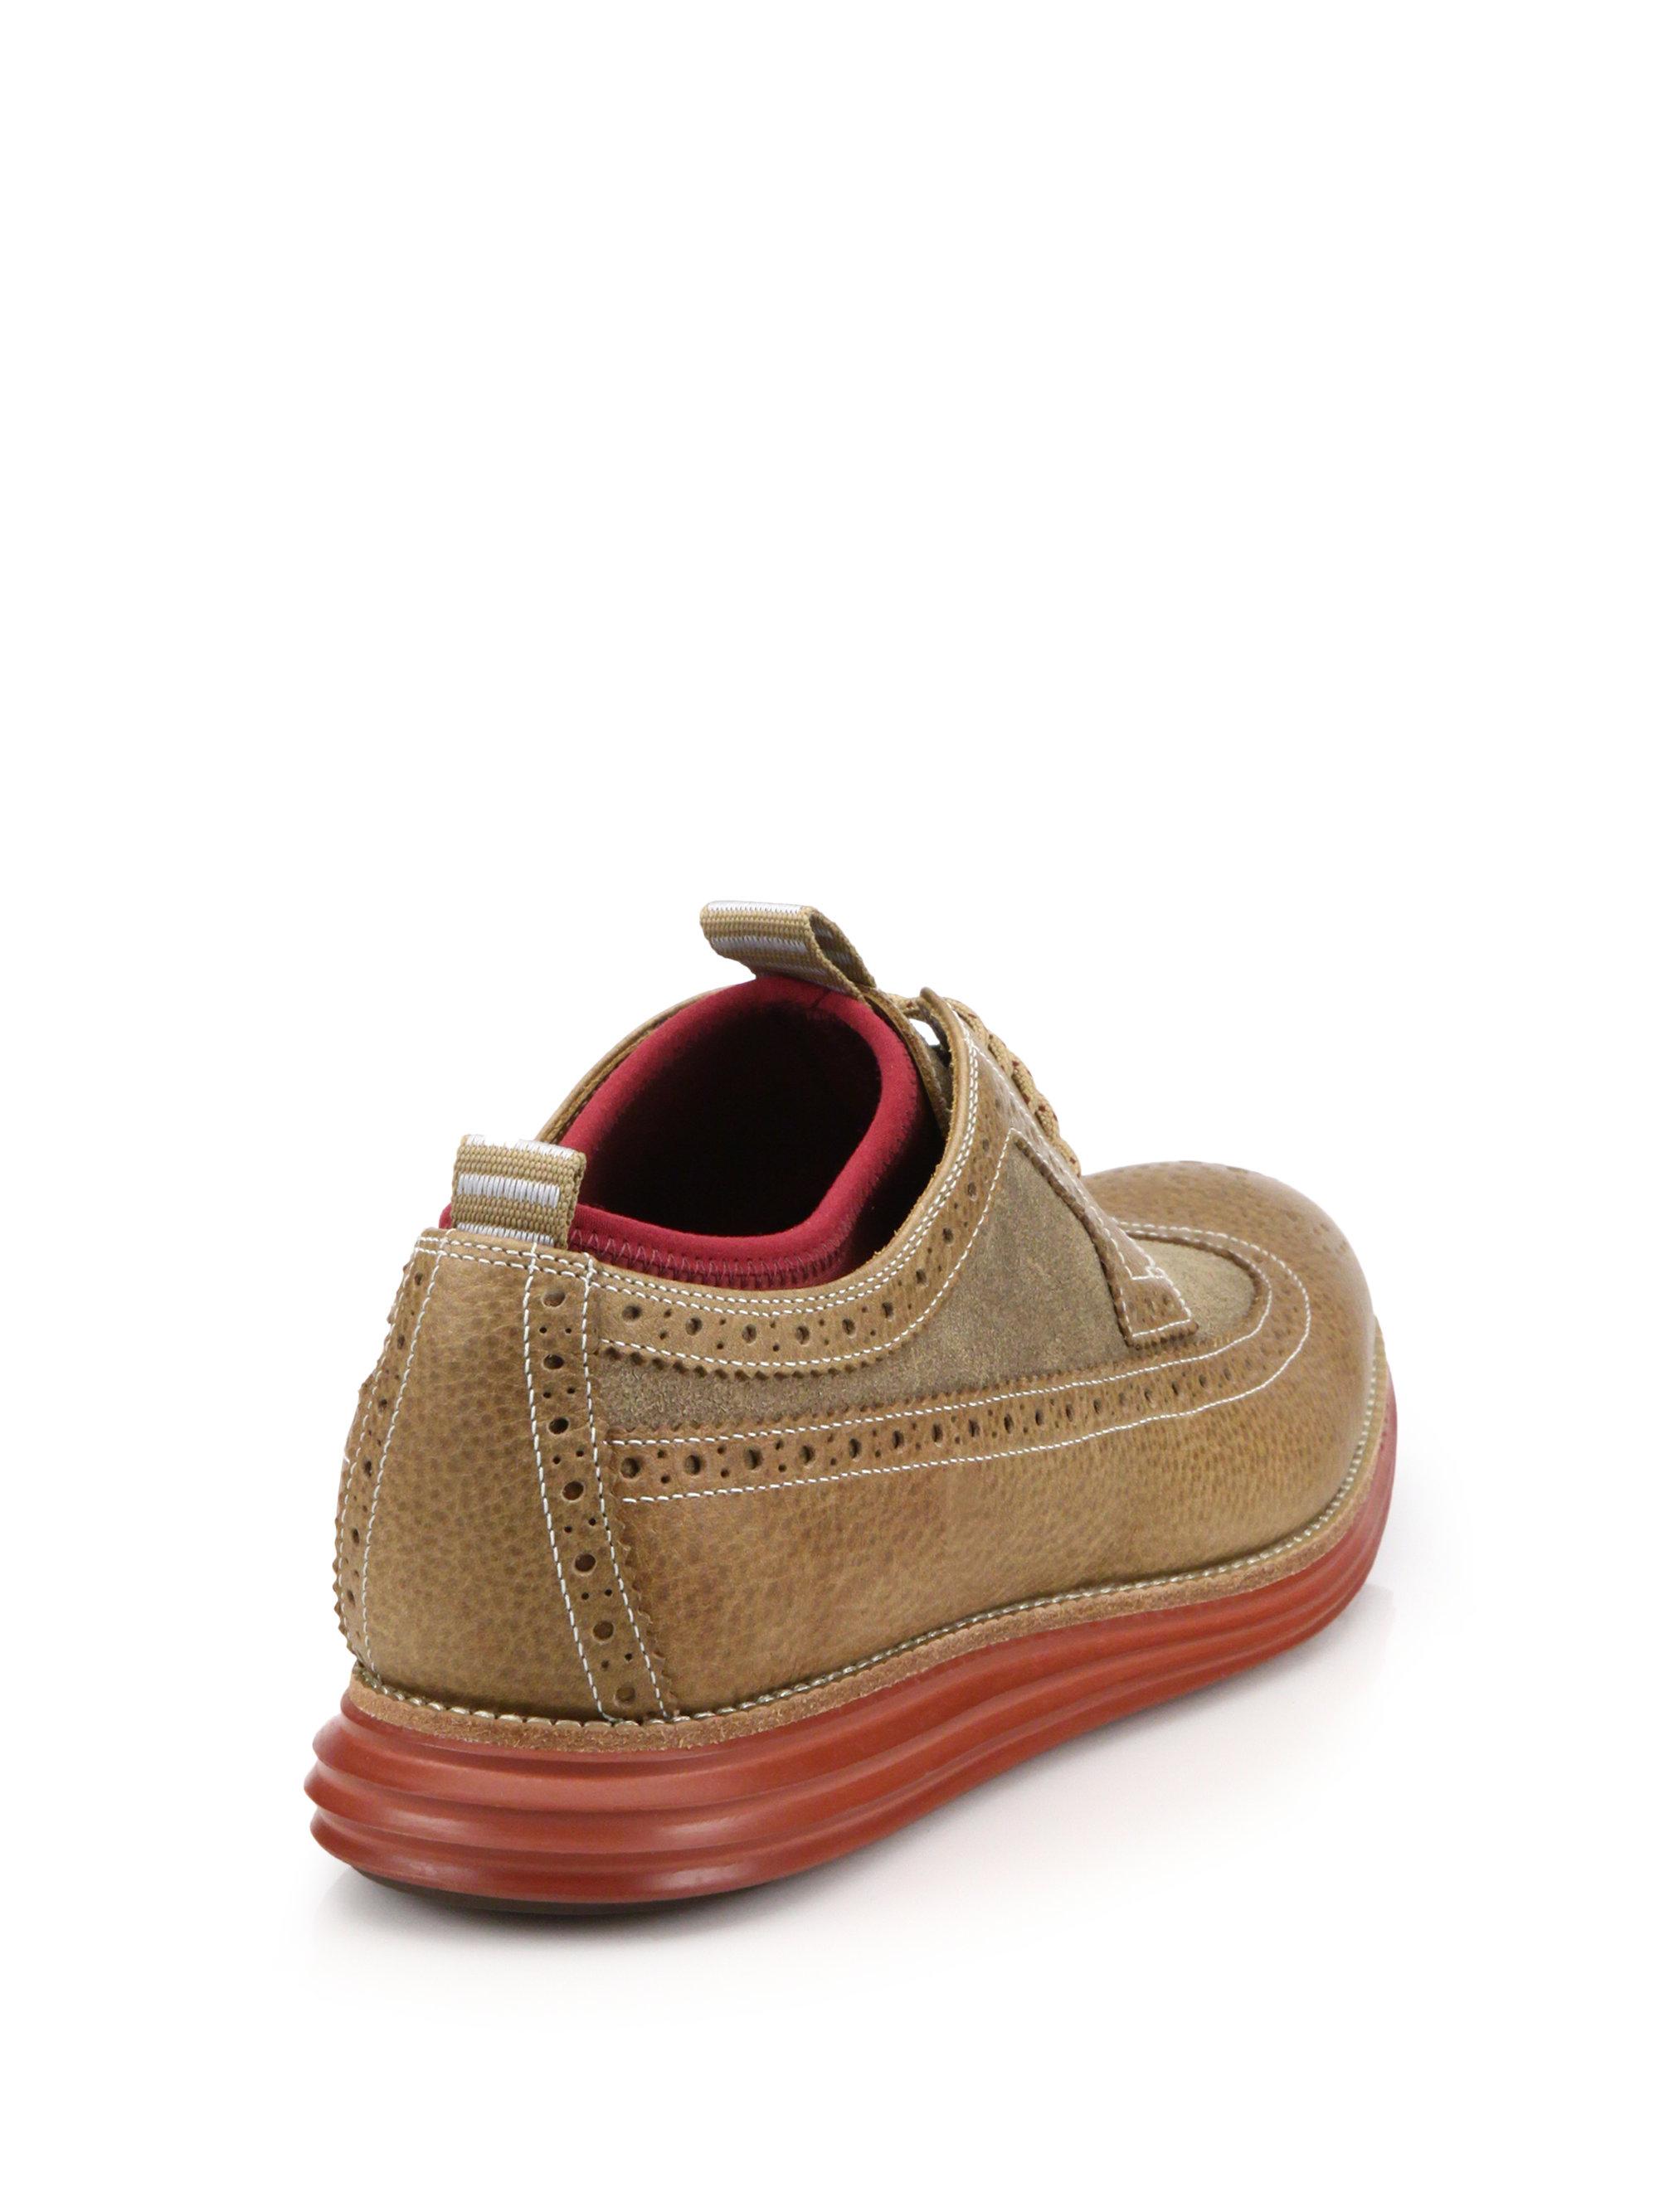 Cole Haan Lunar Grand Wingtip Derby Sneakers In Brown For